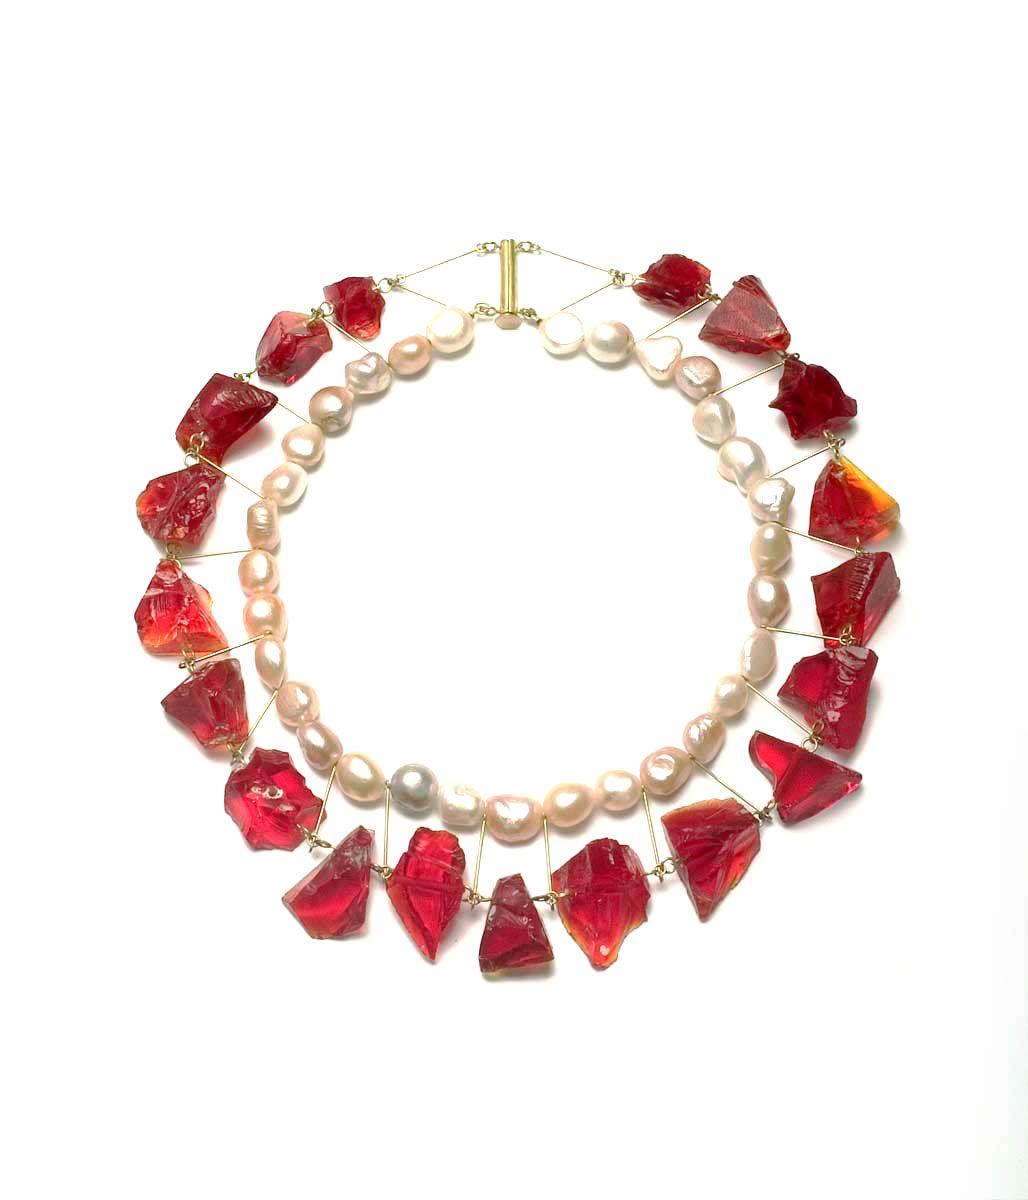 Philip Sajet Pearls and Glass